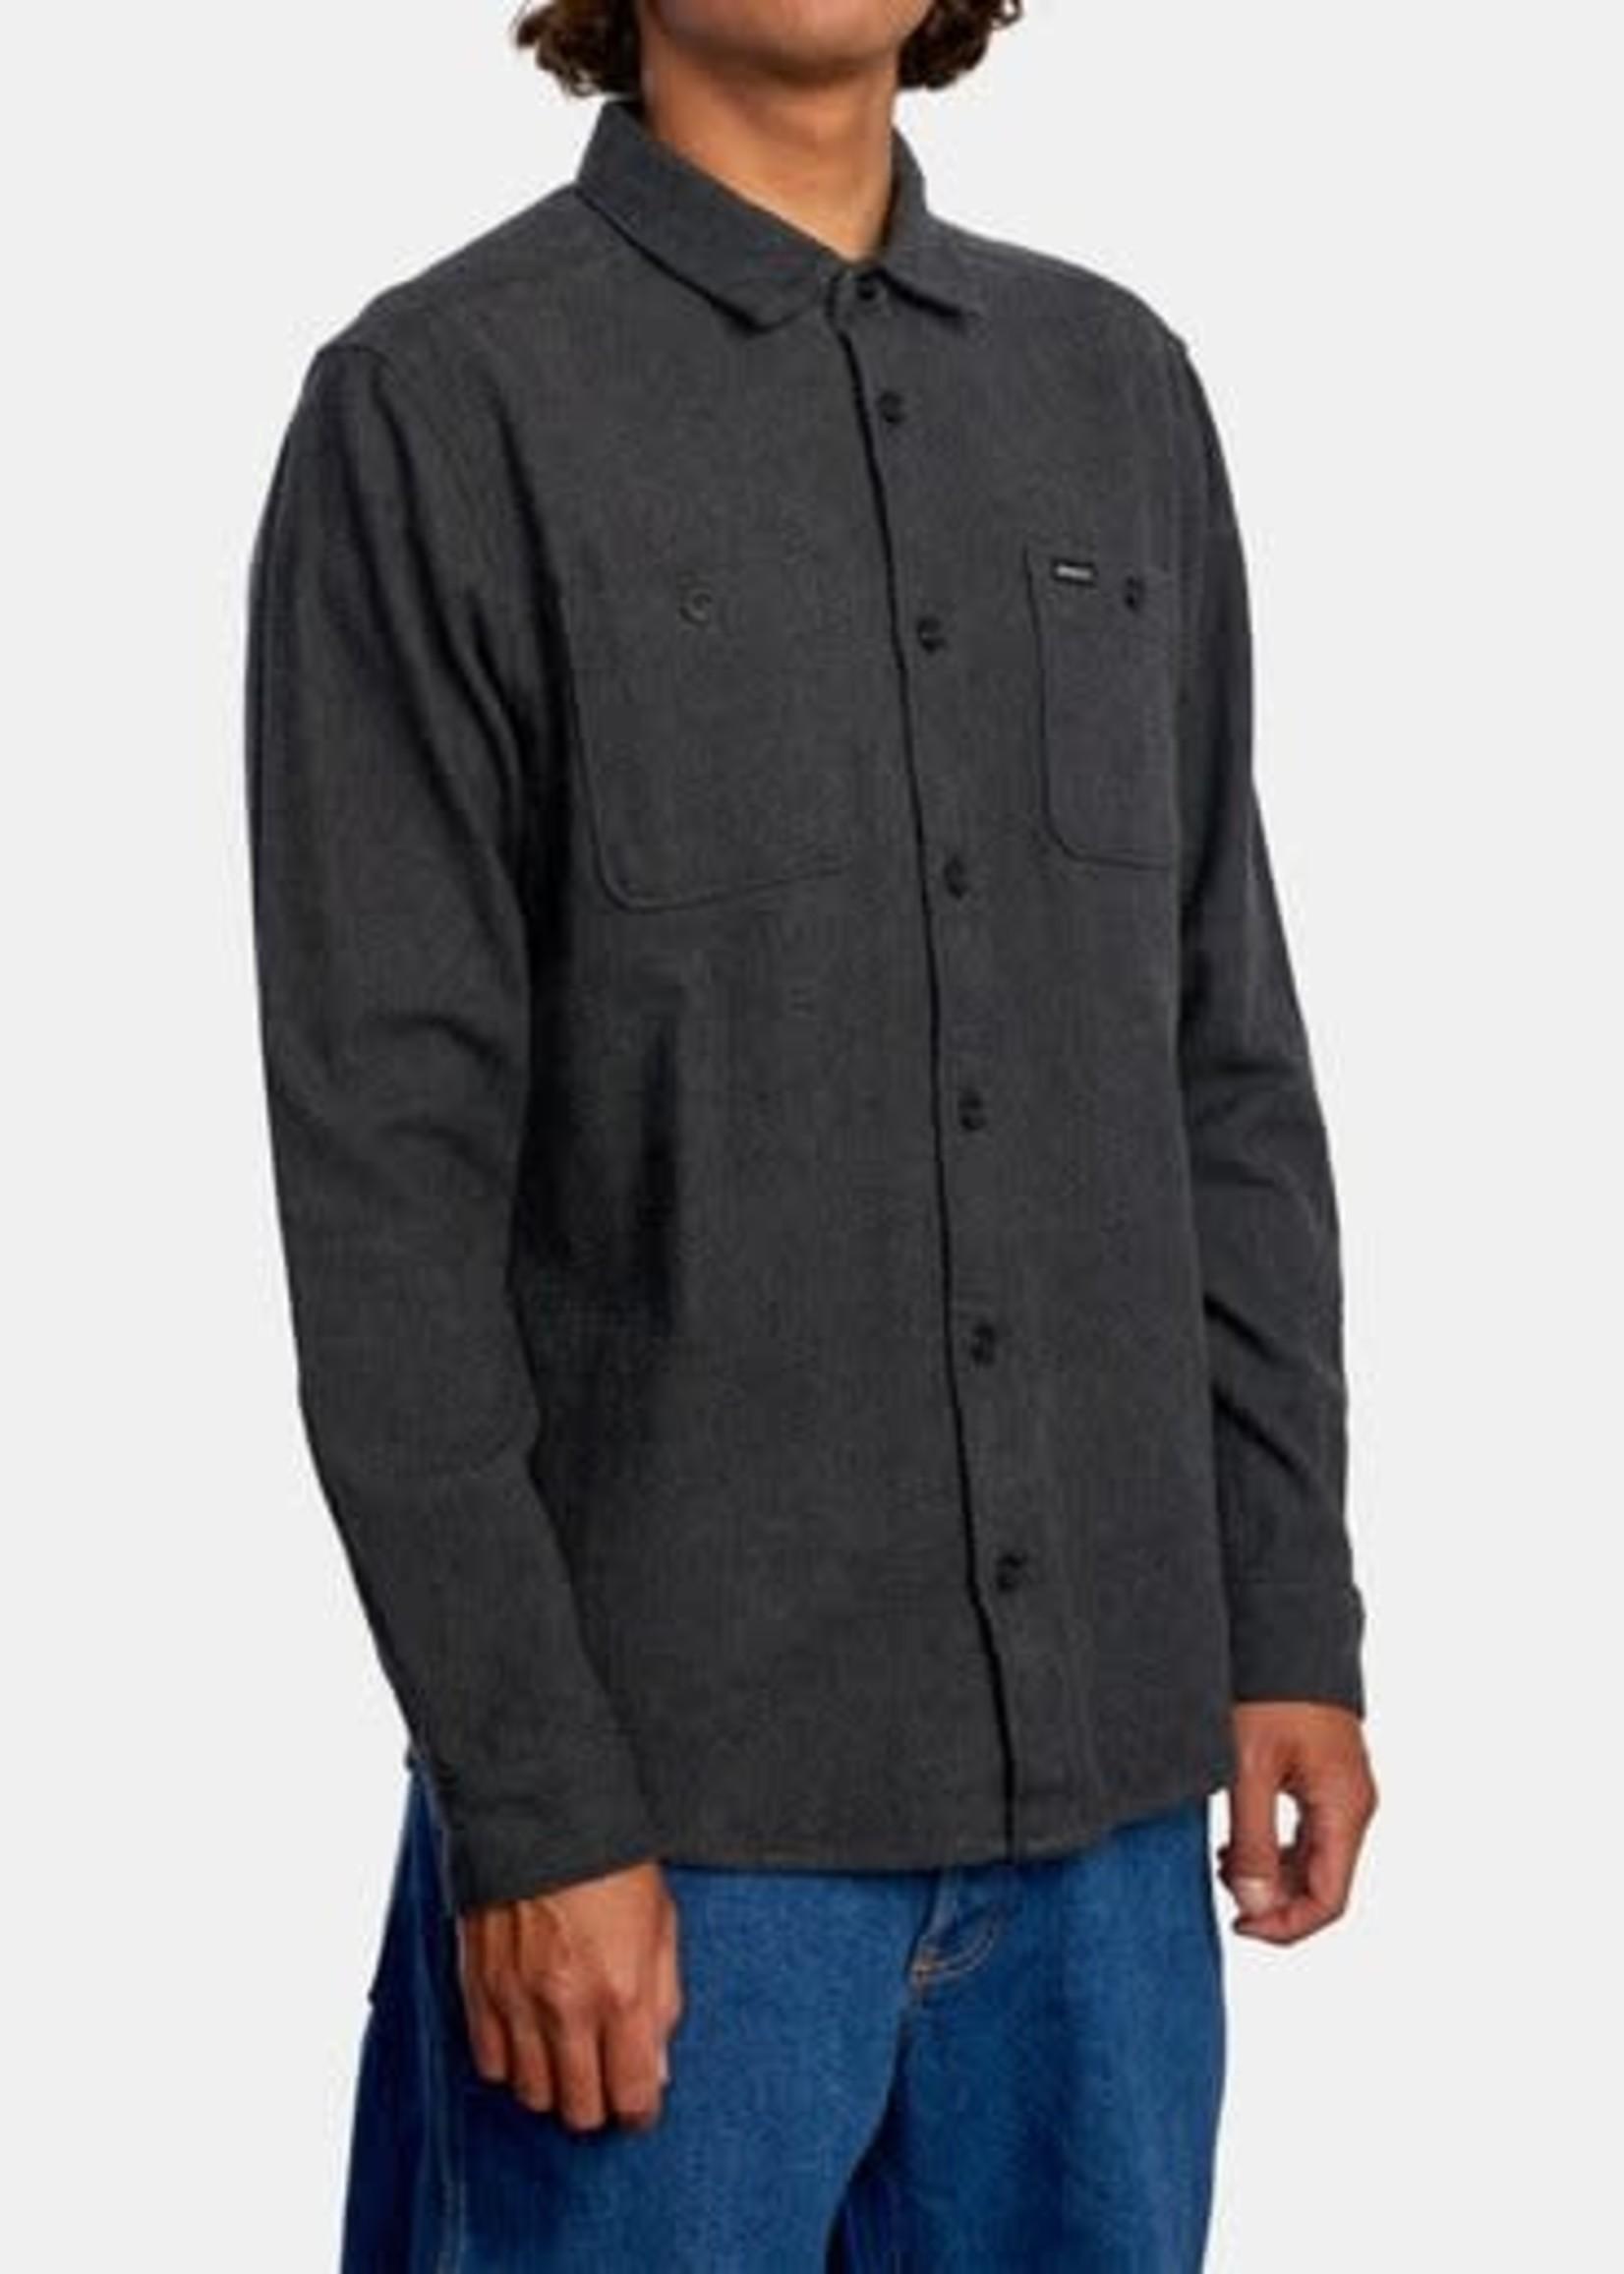 RVCA Harvest Long Sleeve Flannel